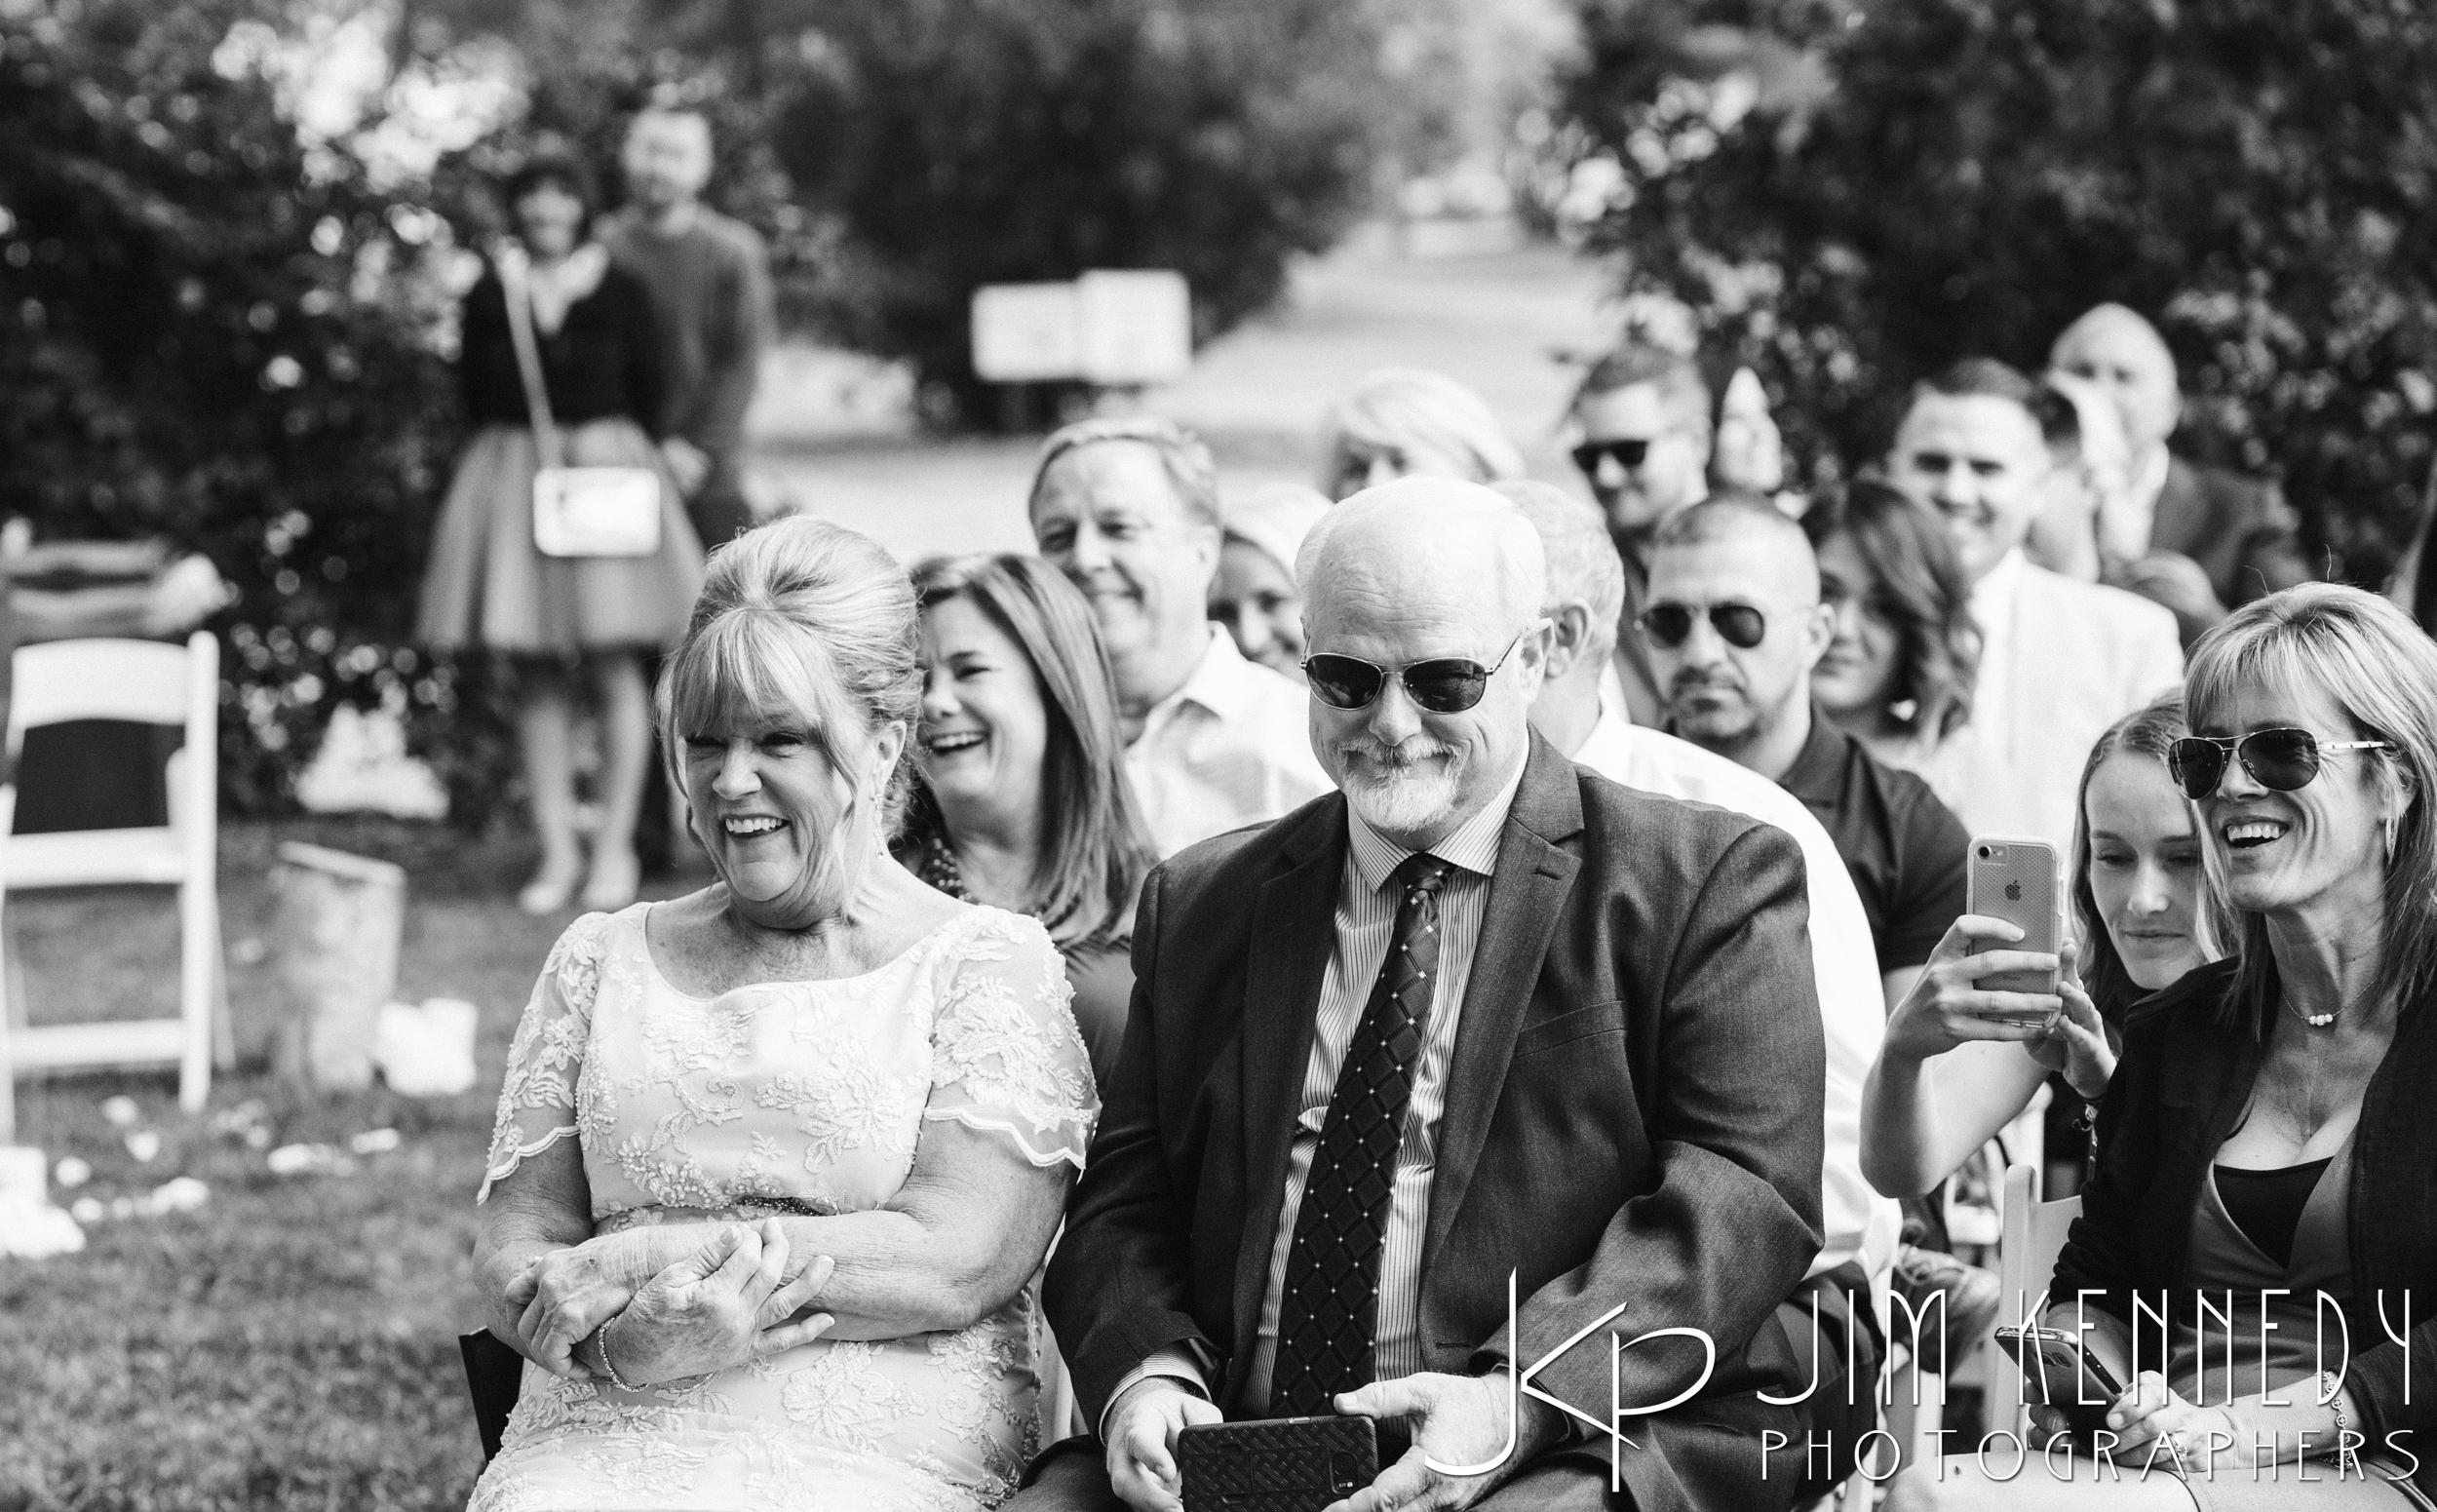 jim_kennedy_photographers_highland_springs_wedding_caitlyn_0118.jpg